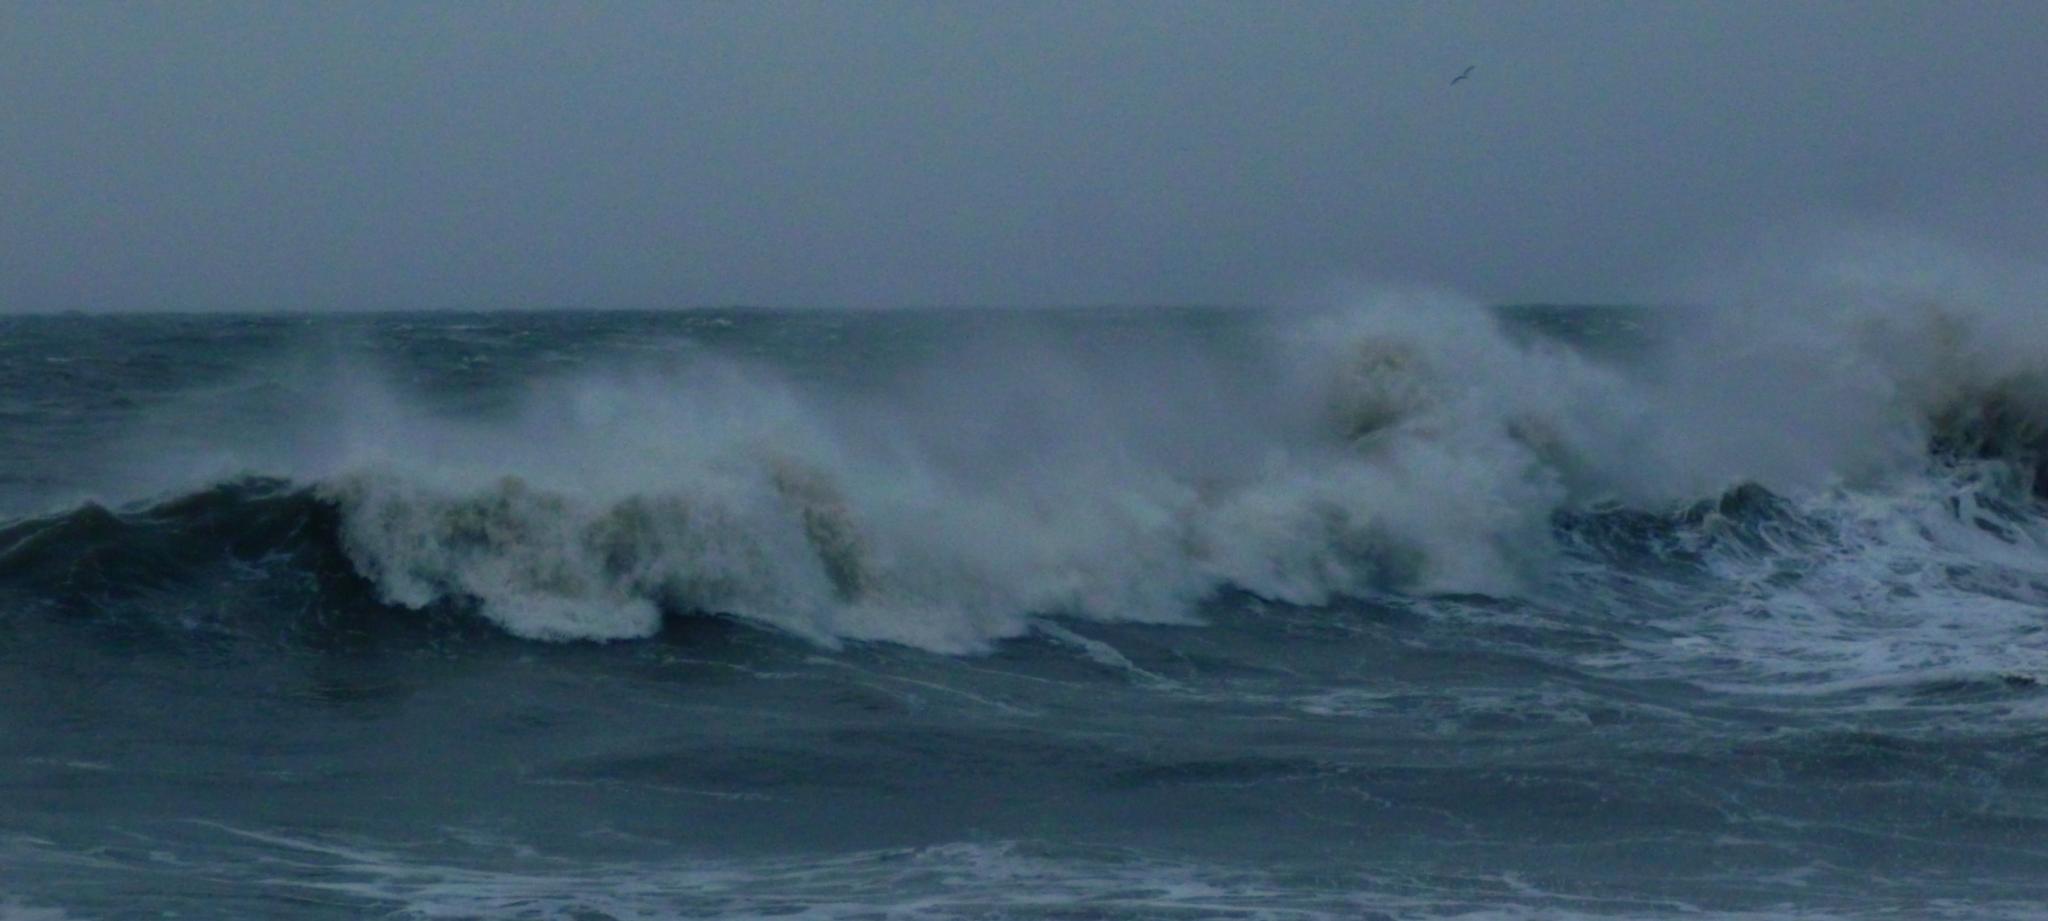 foaming sea by chris.adams.3557